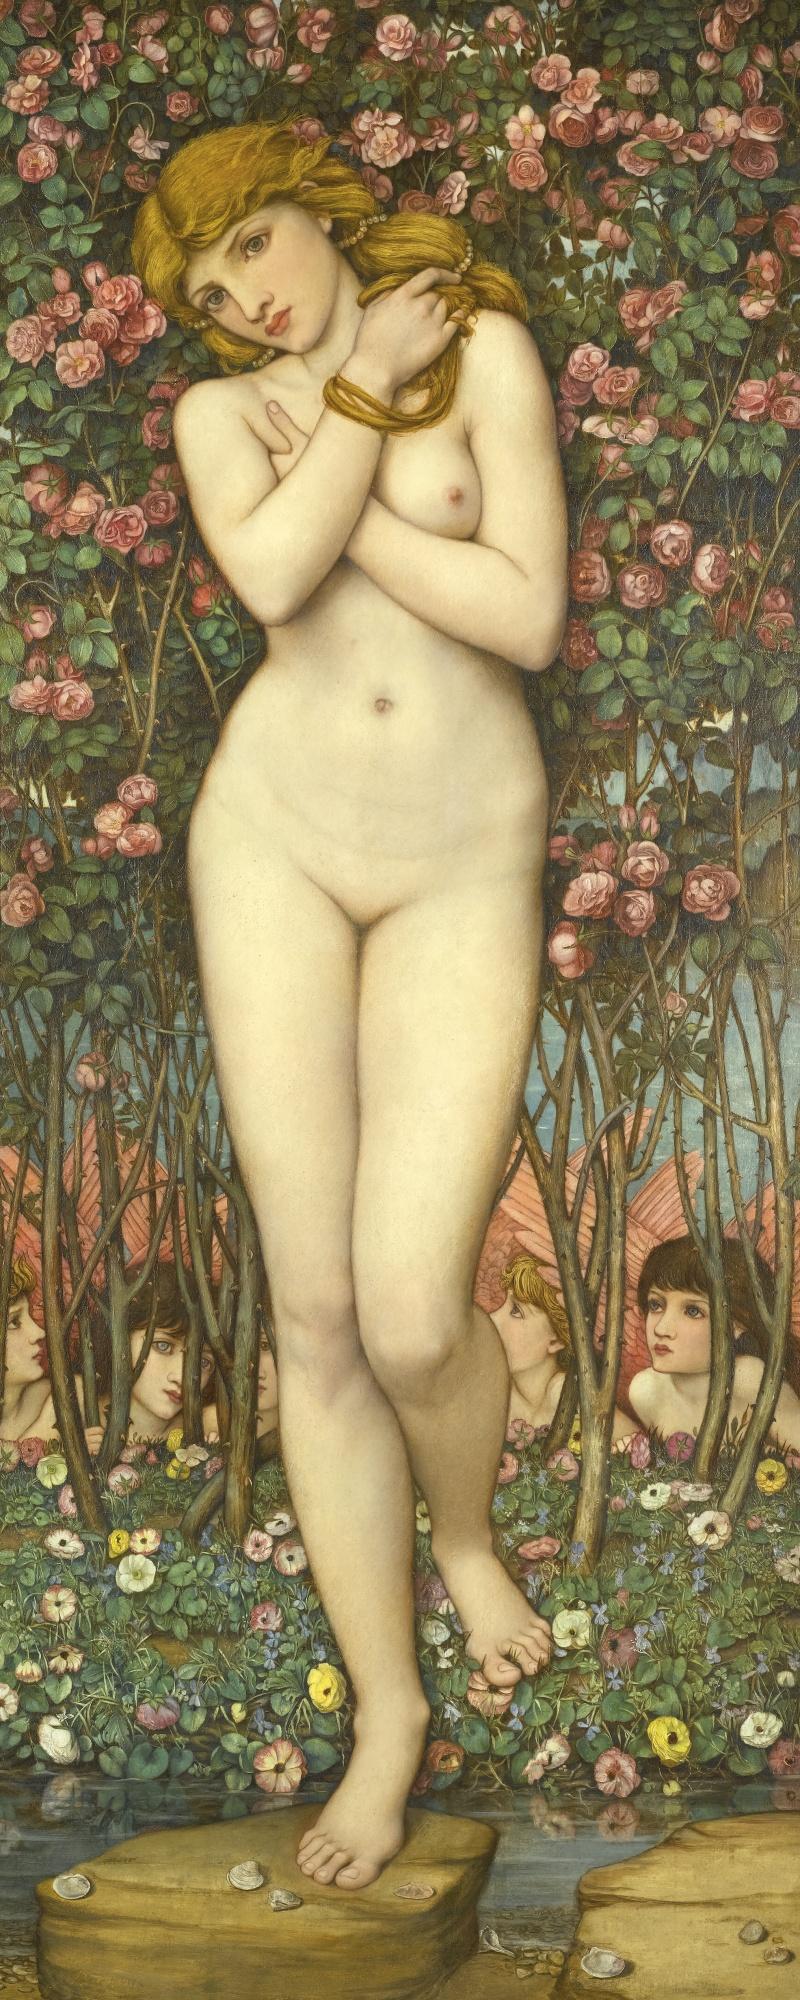 John Roddam Spencer-Stanhope, 1829-1908. Флора (Рождение Венеры). 128.5 х 52.5 см. Частная коллекция